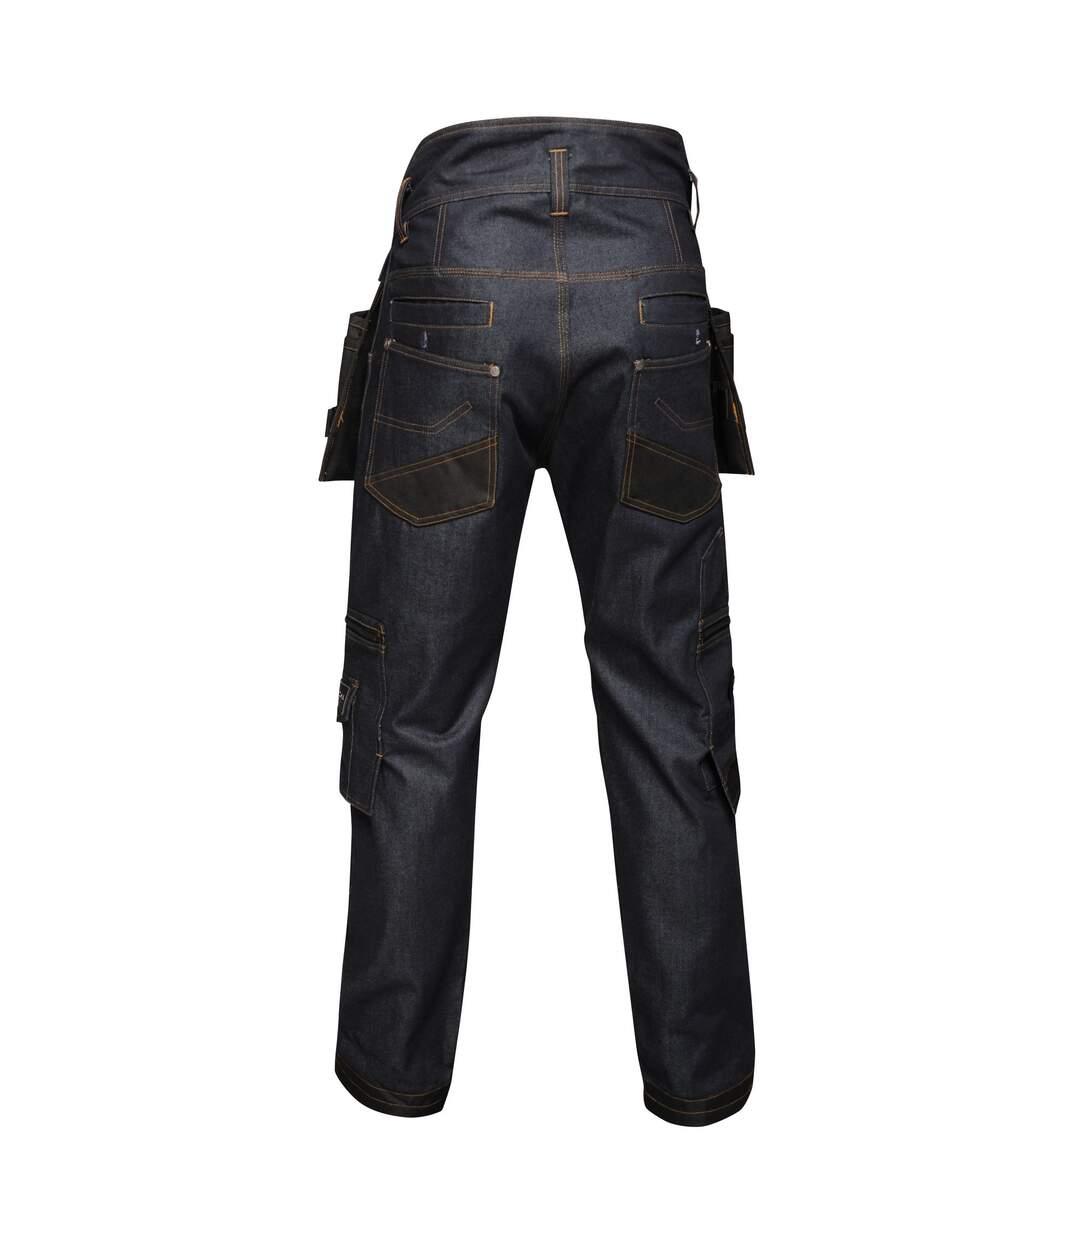 Regatta Mens Deductive Denim Trousers (Dark Denim) - UTRG3808